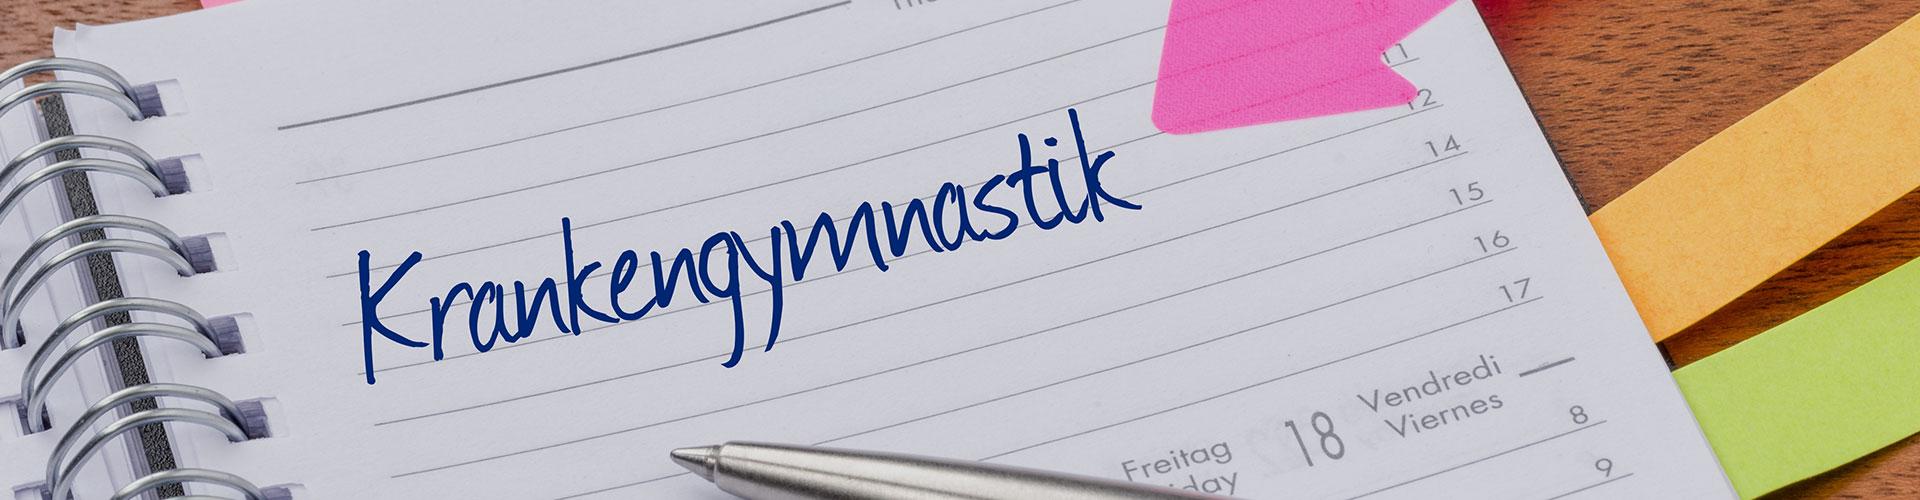 Termin vereinbaren, Physiotherapie in Deggendorf, Praxis Bielmeier